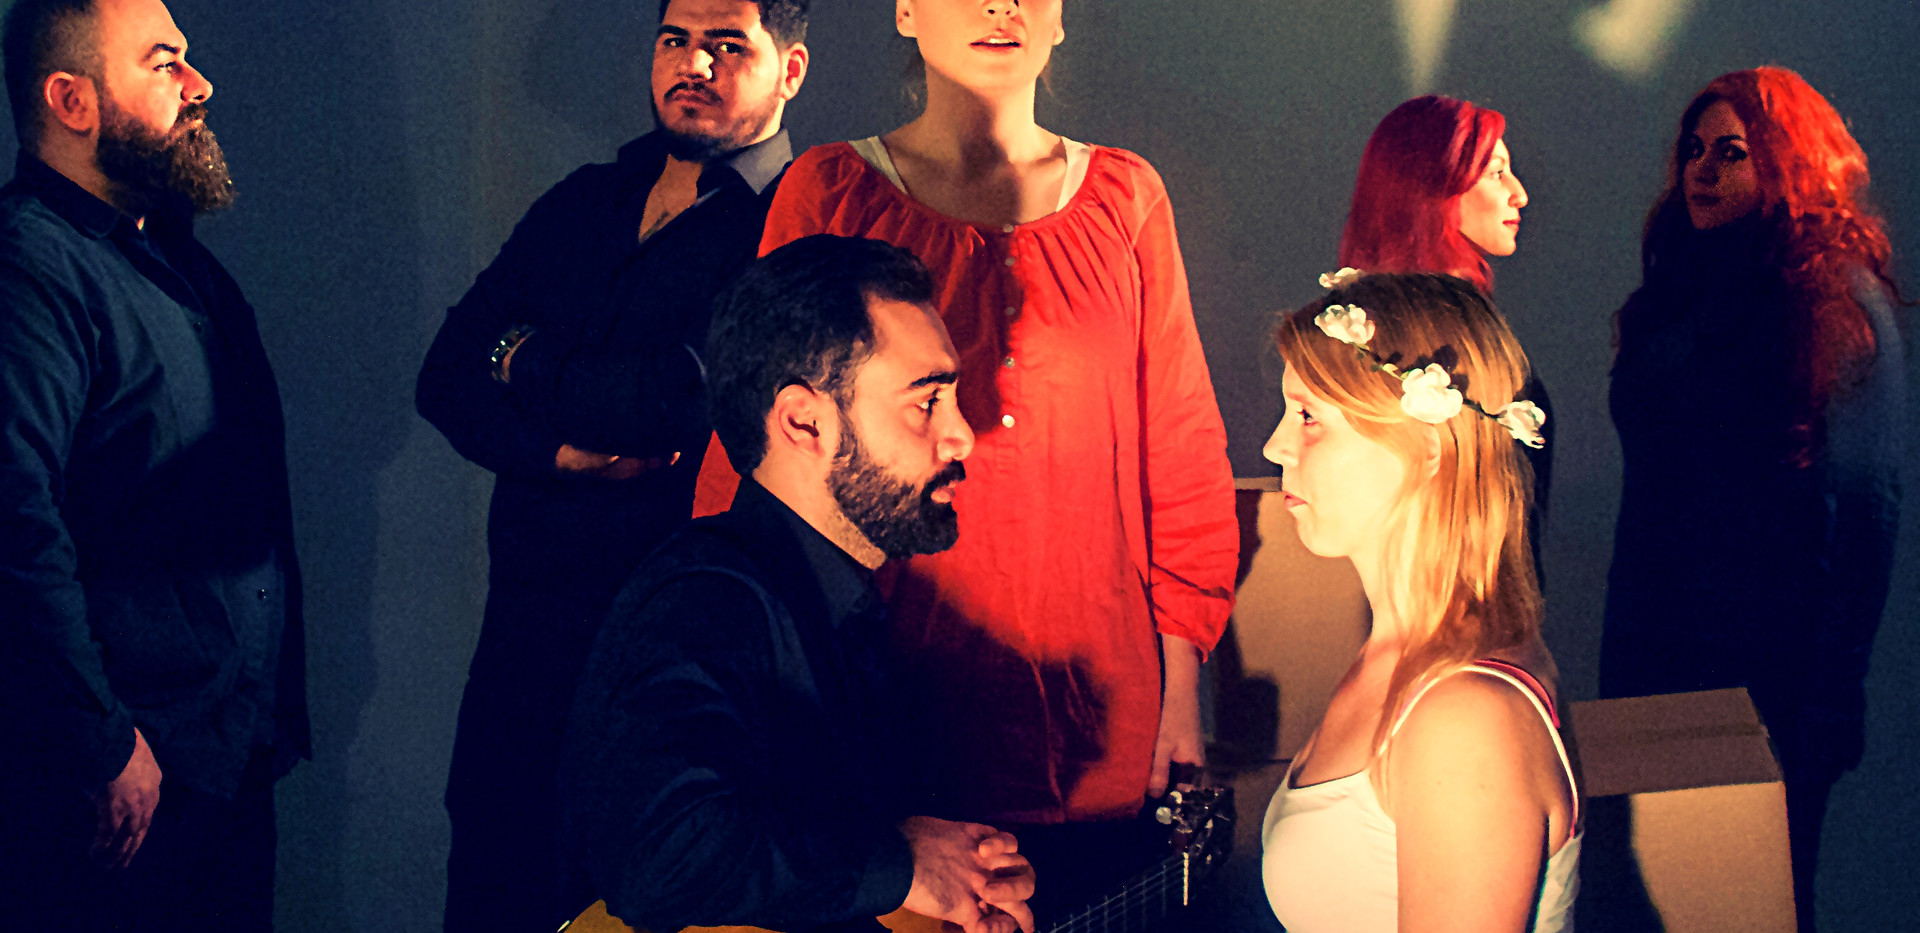 Orfeo - Eine transkulturelle Oper